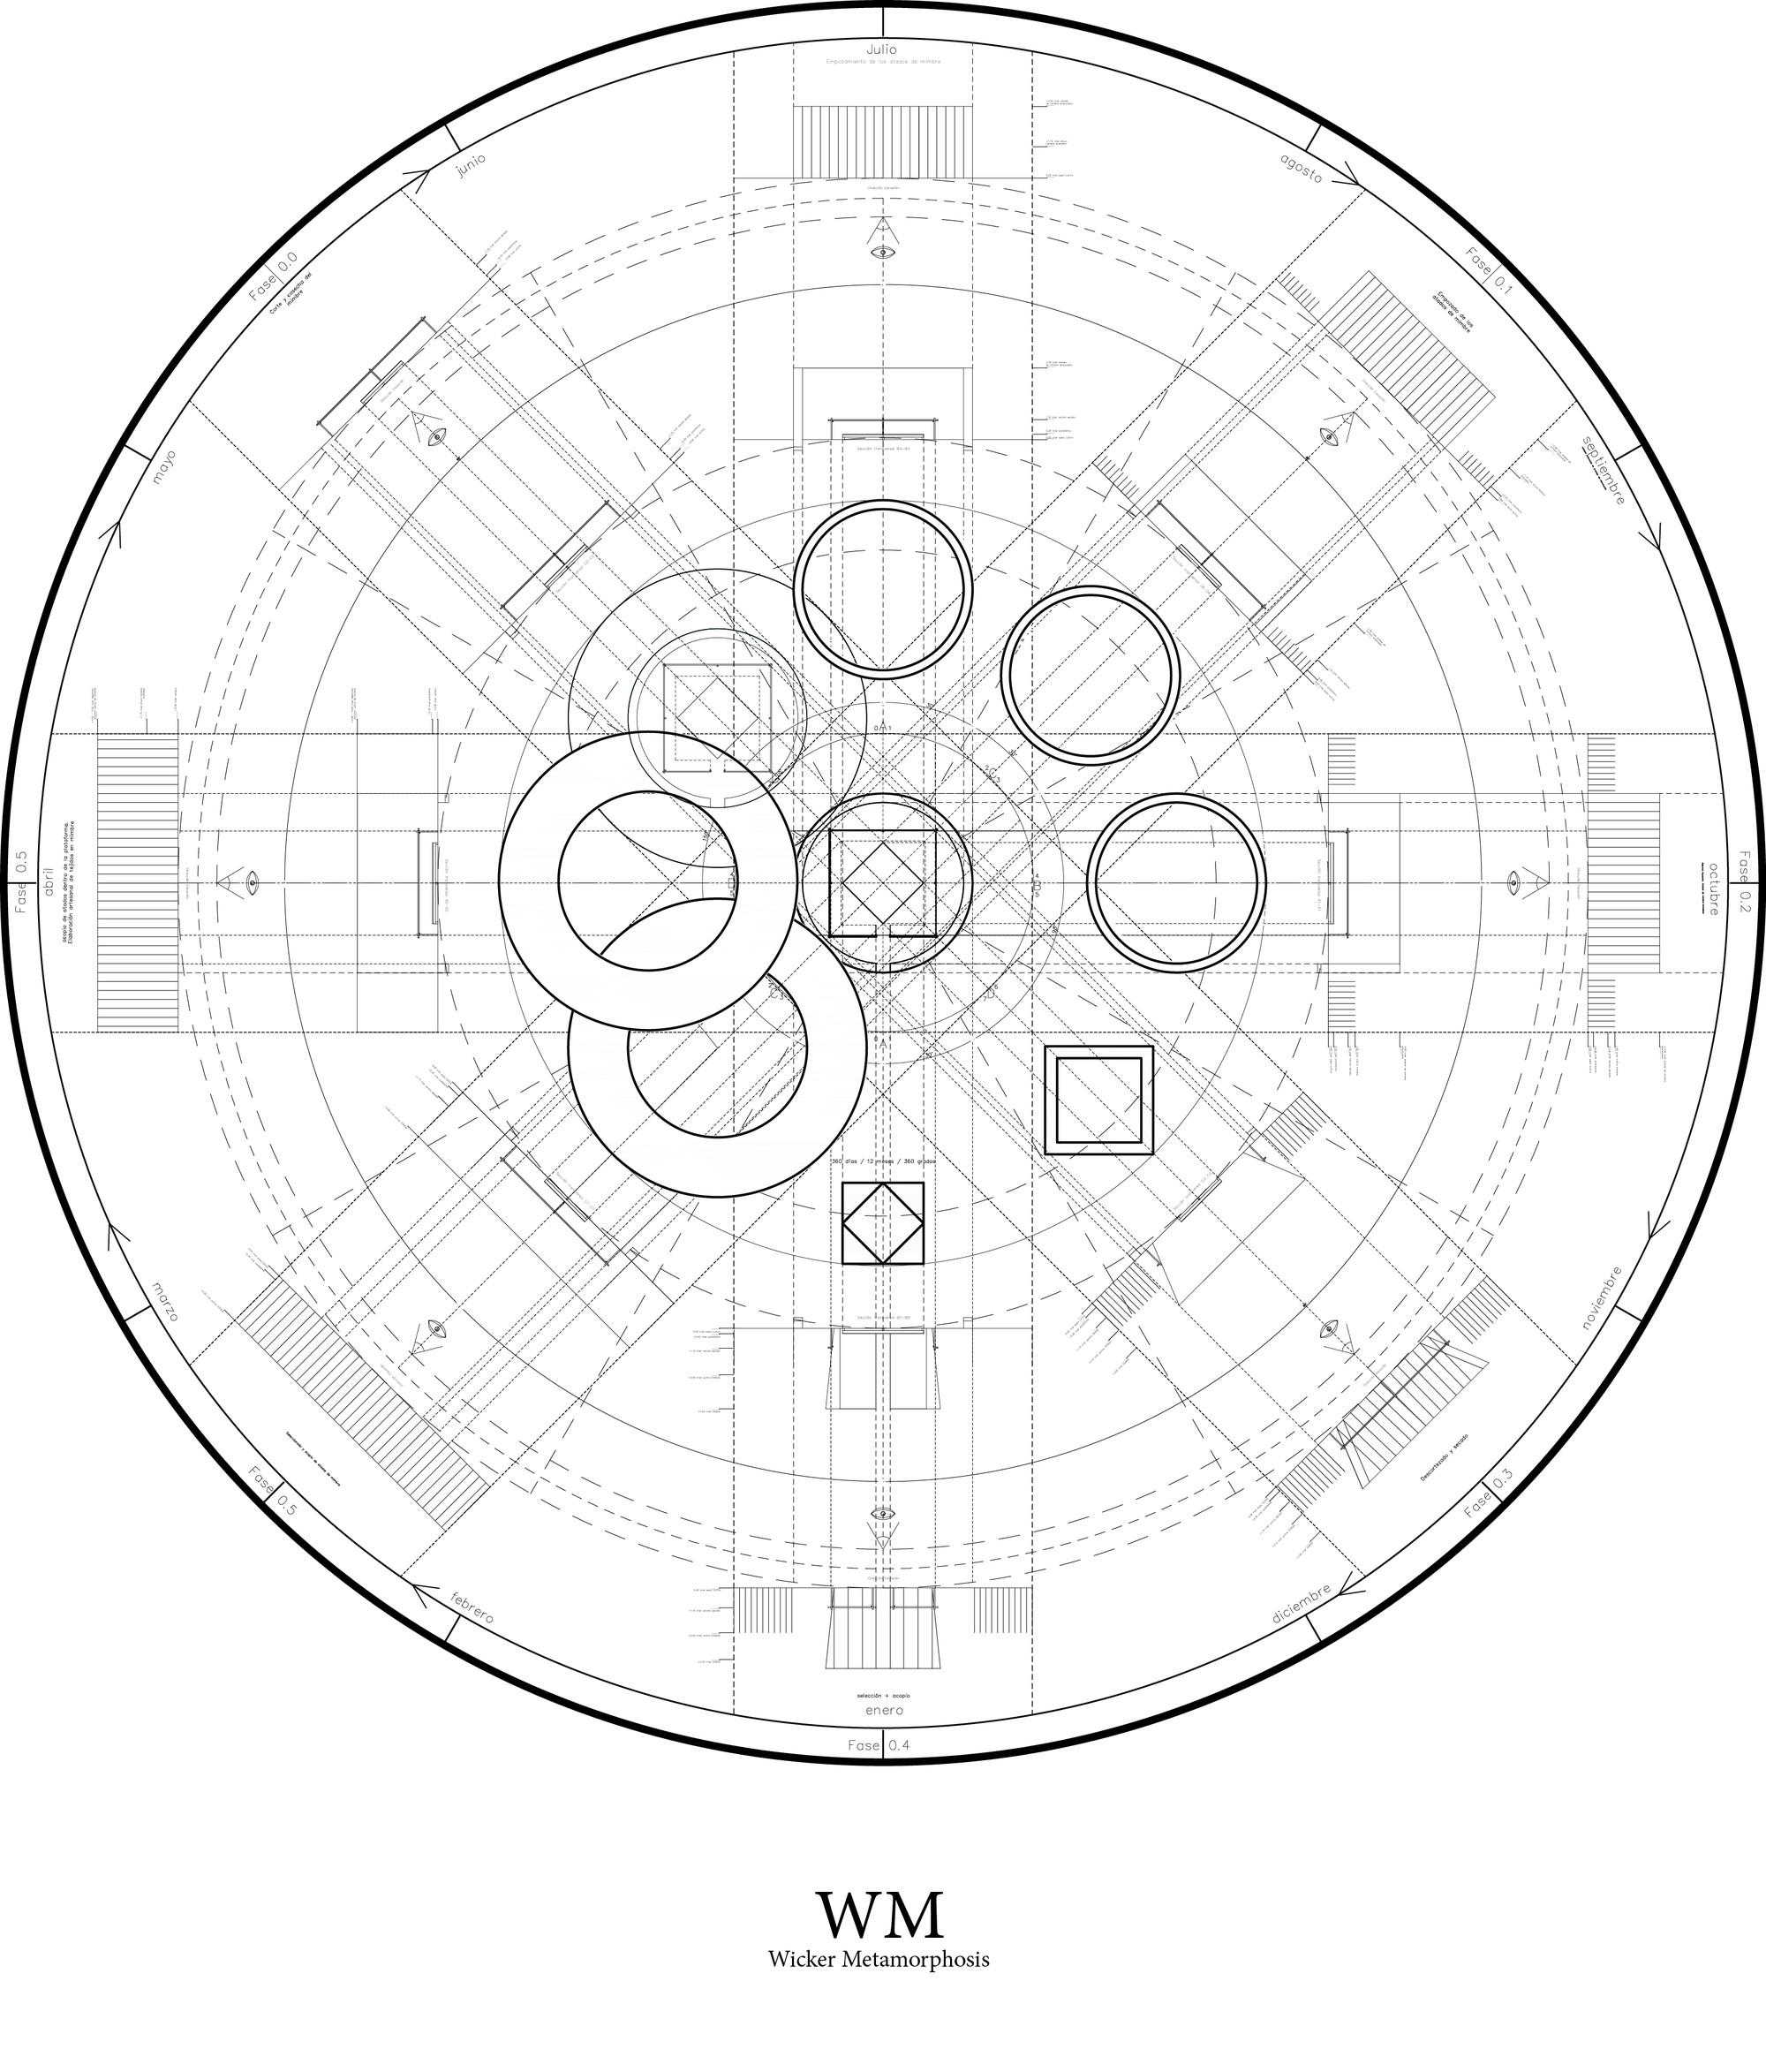 Gallery of Wicker Metamorphosis / Normal Architecture Studio